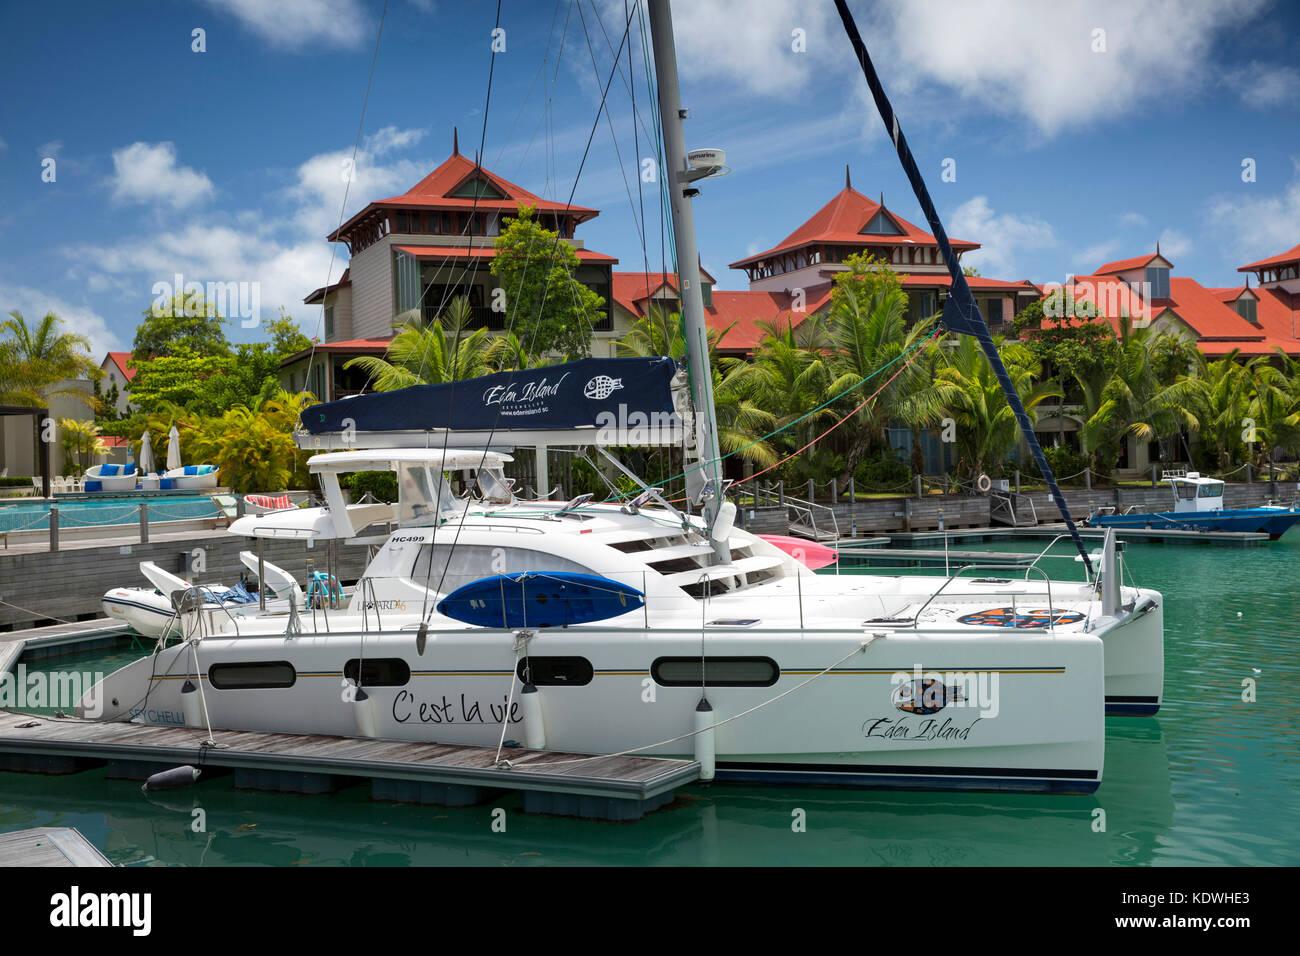 The Seychelles, Mahe, Victoria, Eden Island, housing on reclaimed land and boats moored in marina, rental catamaran - Stock Image